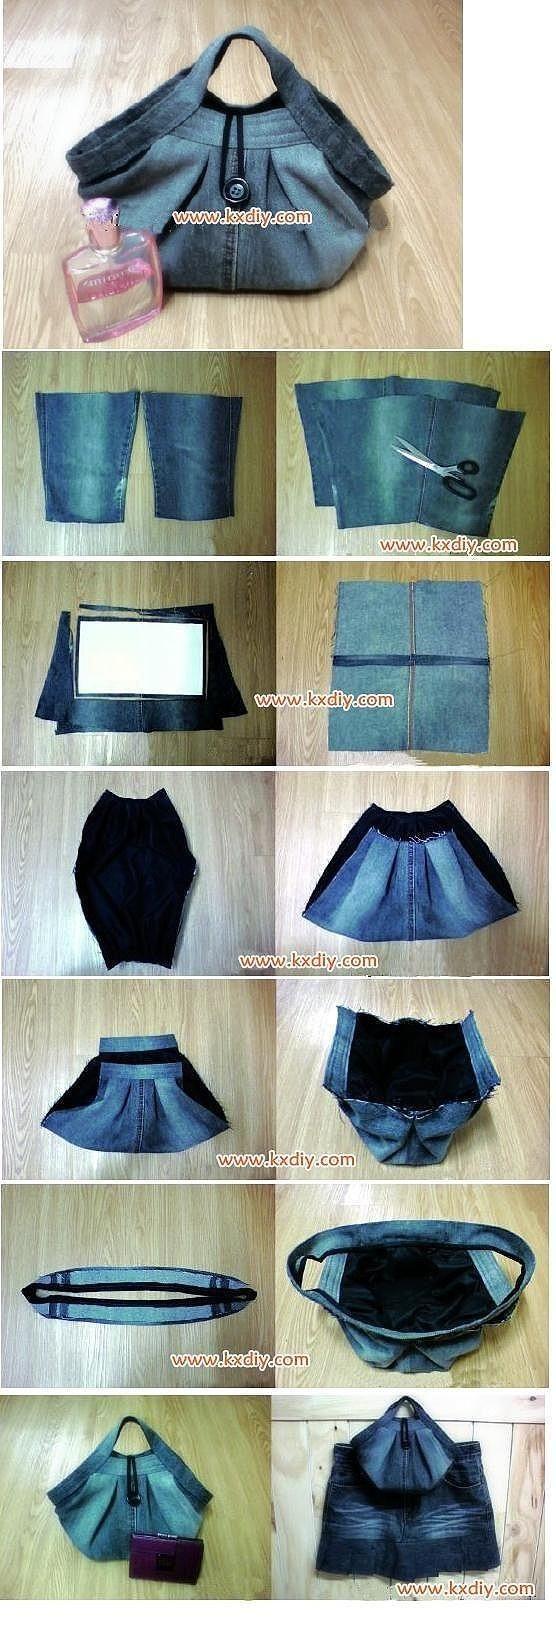 DIY Tutorial: DIY jeans refashion / DIY Used Jeans Handbag - Bead&Cord